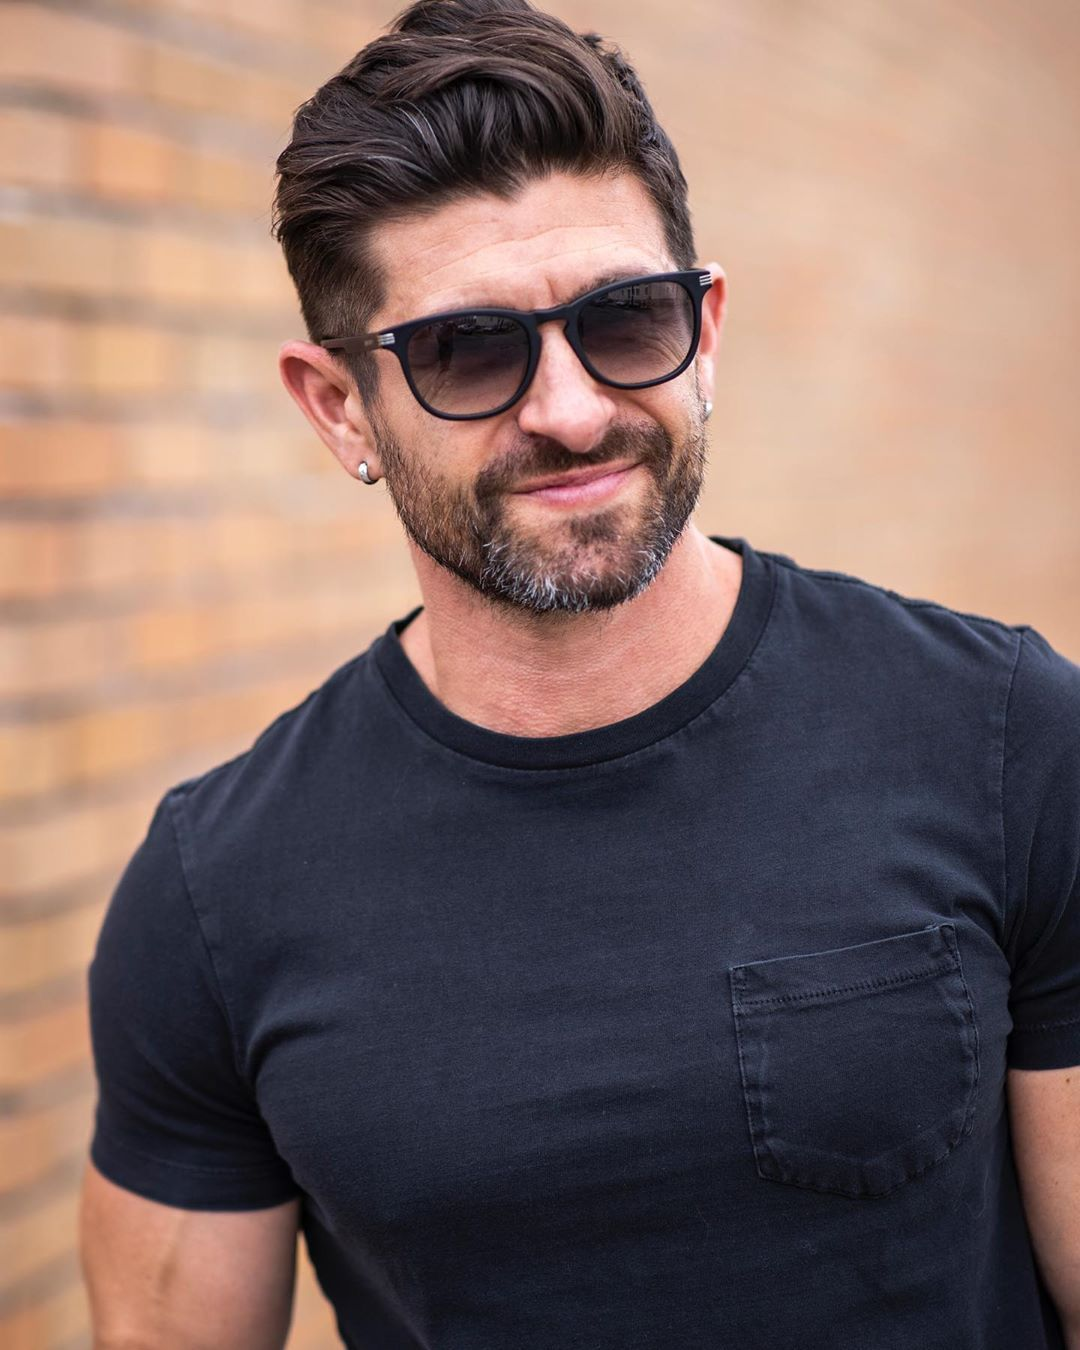 Alpha M Haircut : alpha, haircut, @aaronmarino, Aaron, Marino, (Alpha, Looking, Ahead, Weekend., Square, Sunglasses, Sunglasses,, Rayban, Wayfarer